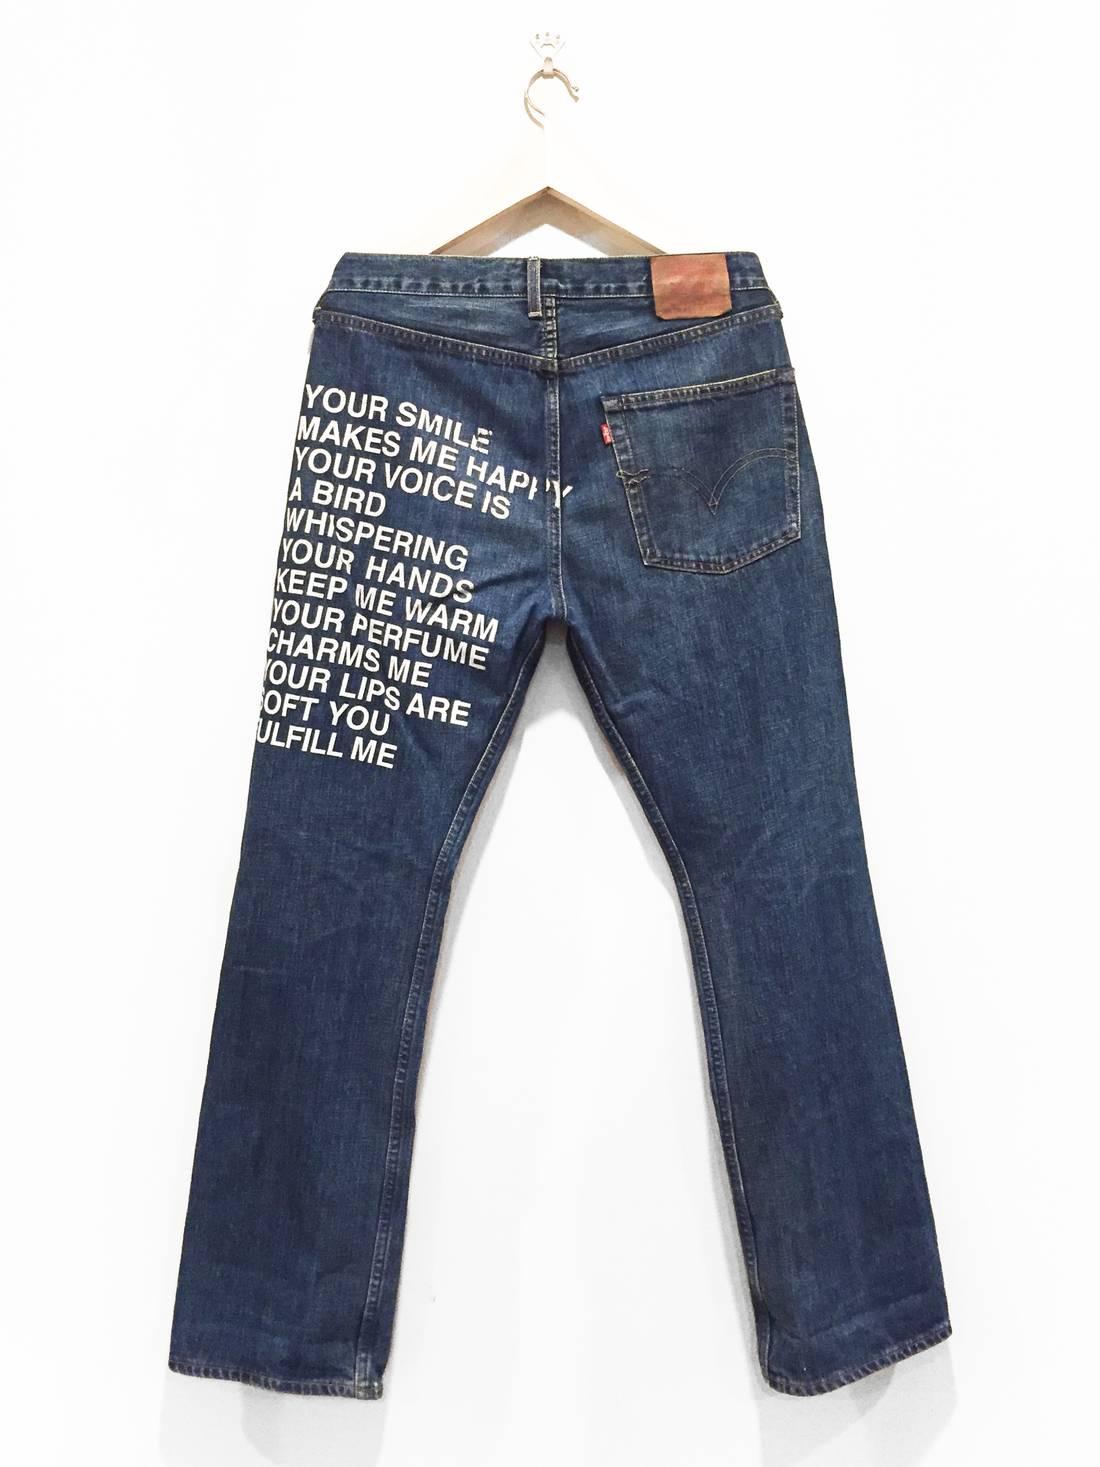 DENIM - Denim trousers Poems